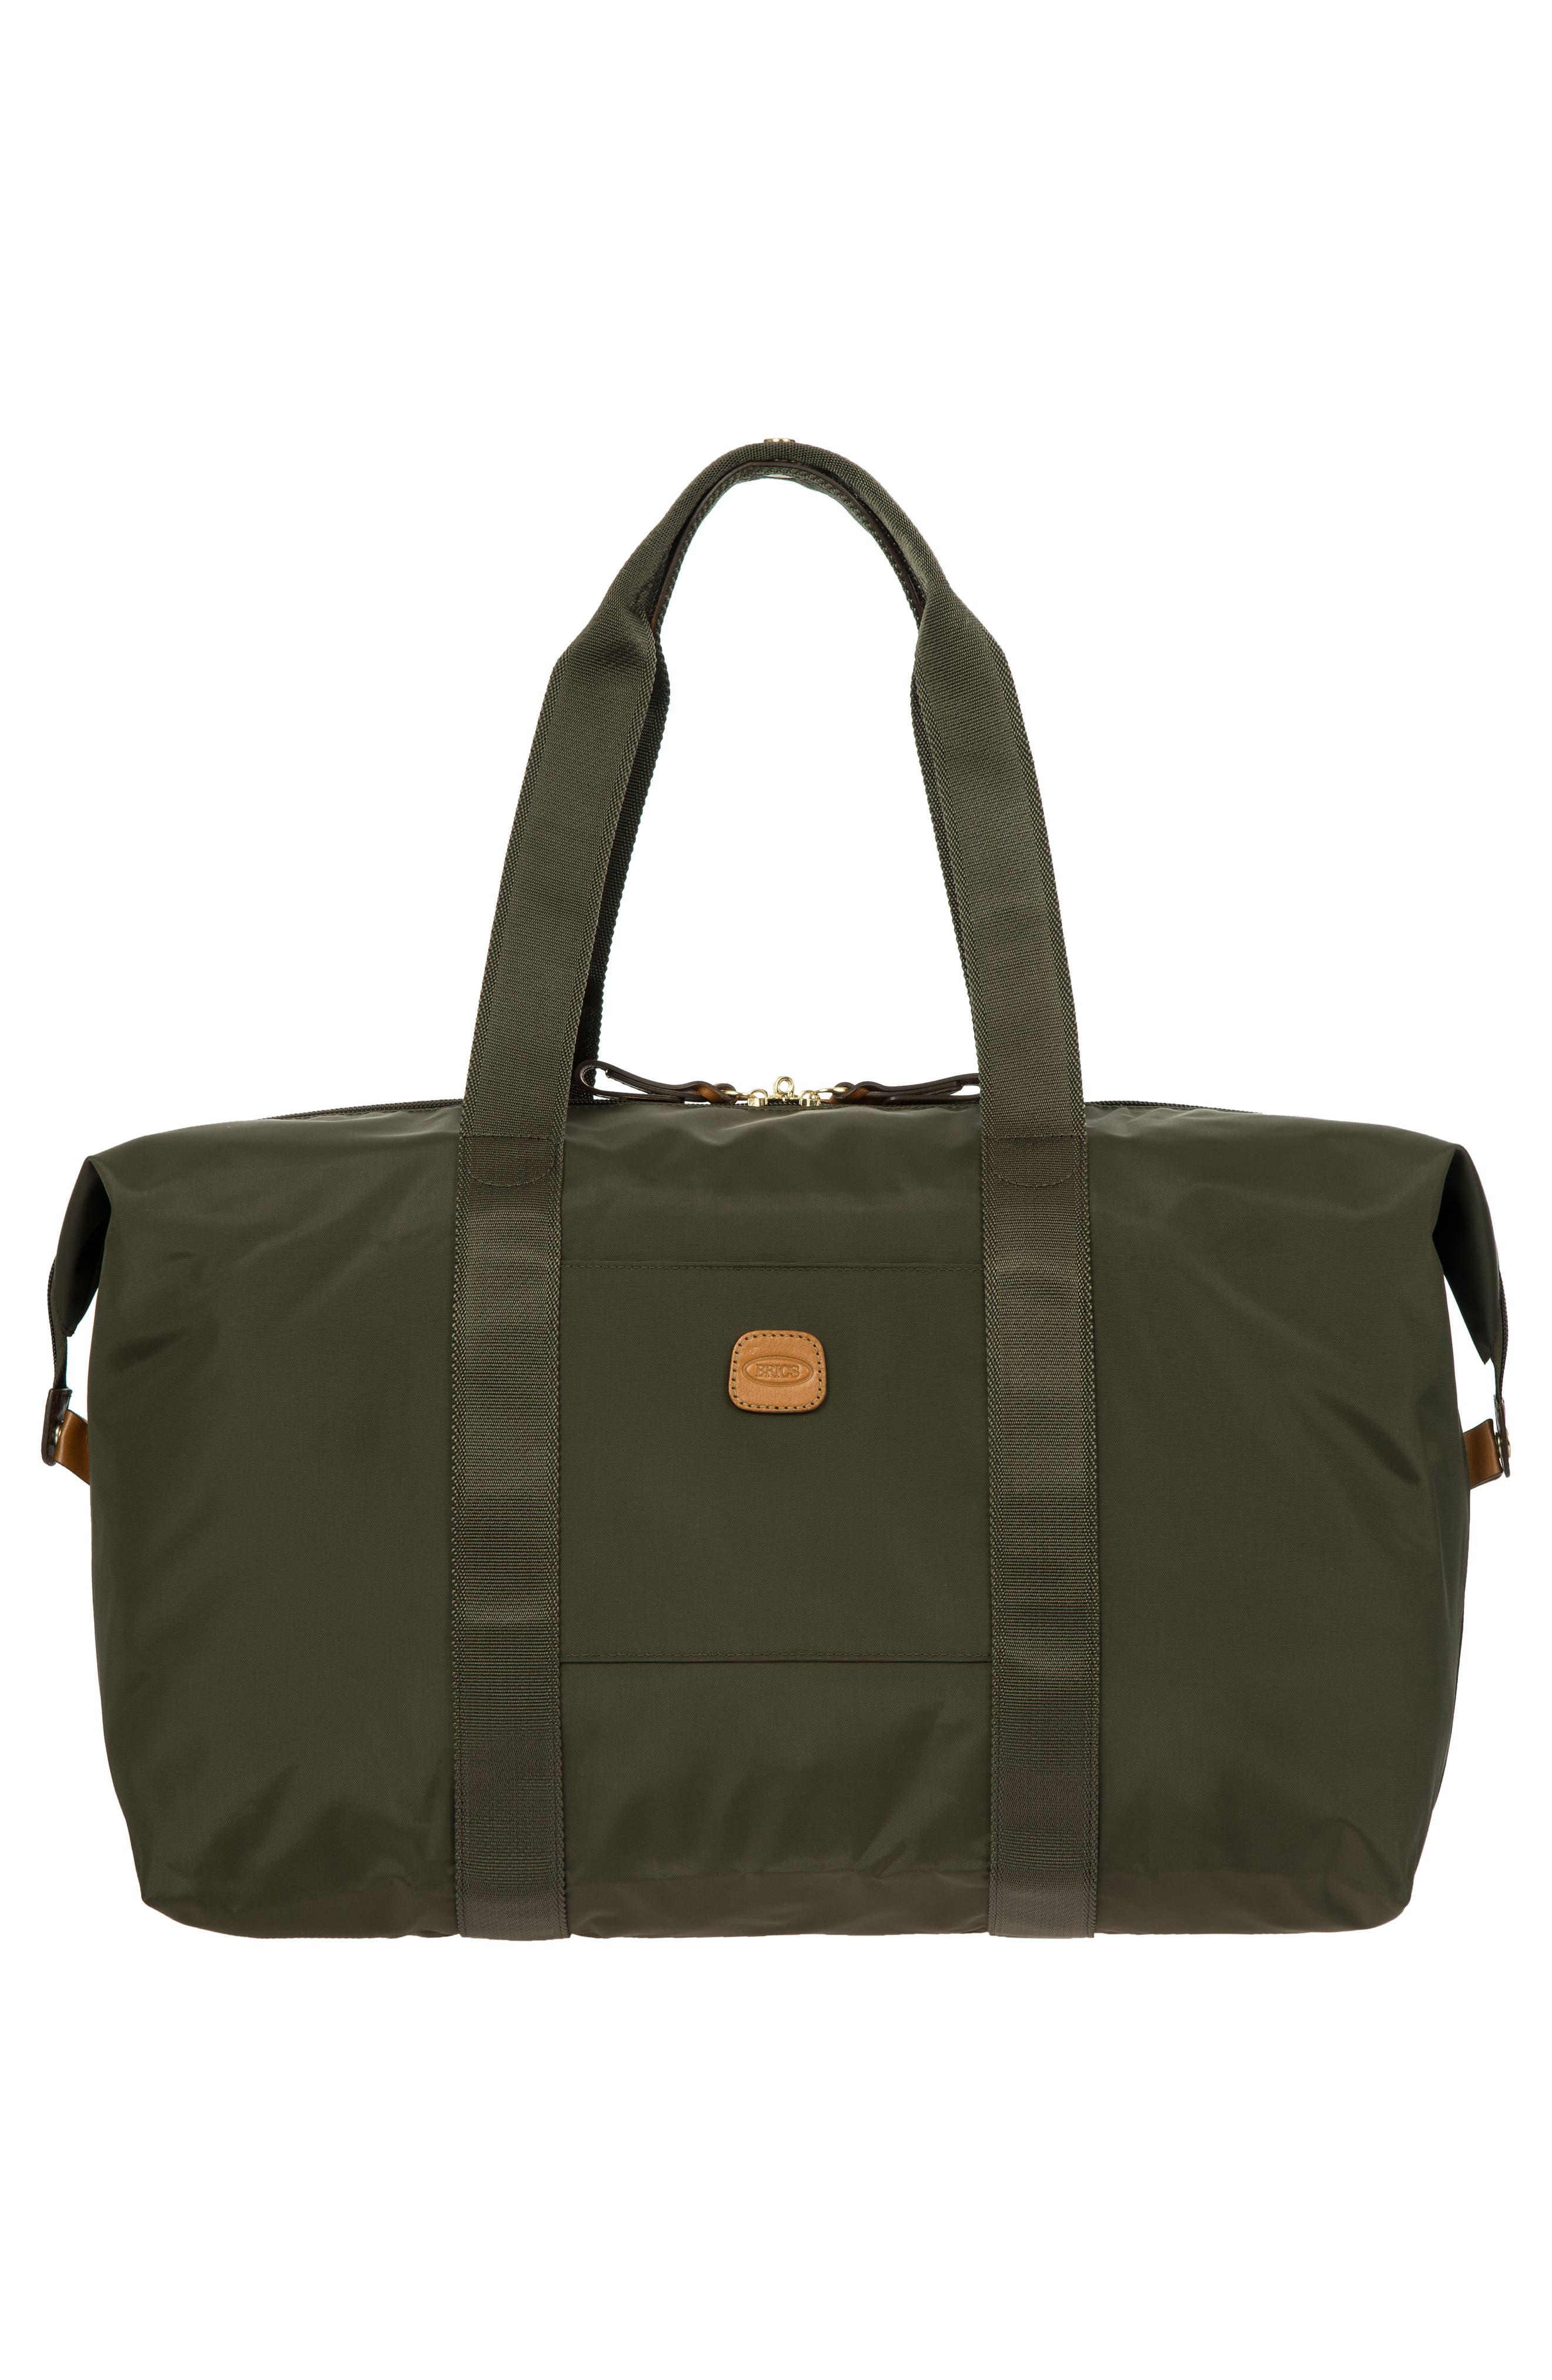 X-Bag 18-Inch Folding Duffel Bag,                             Alternate thumbnail 5, color,                             Olive